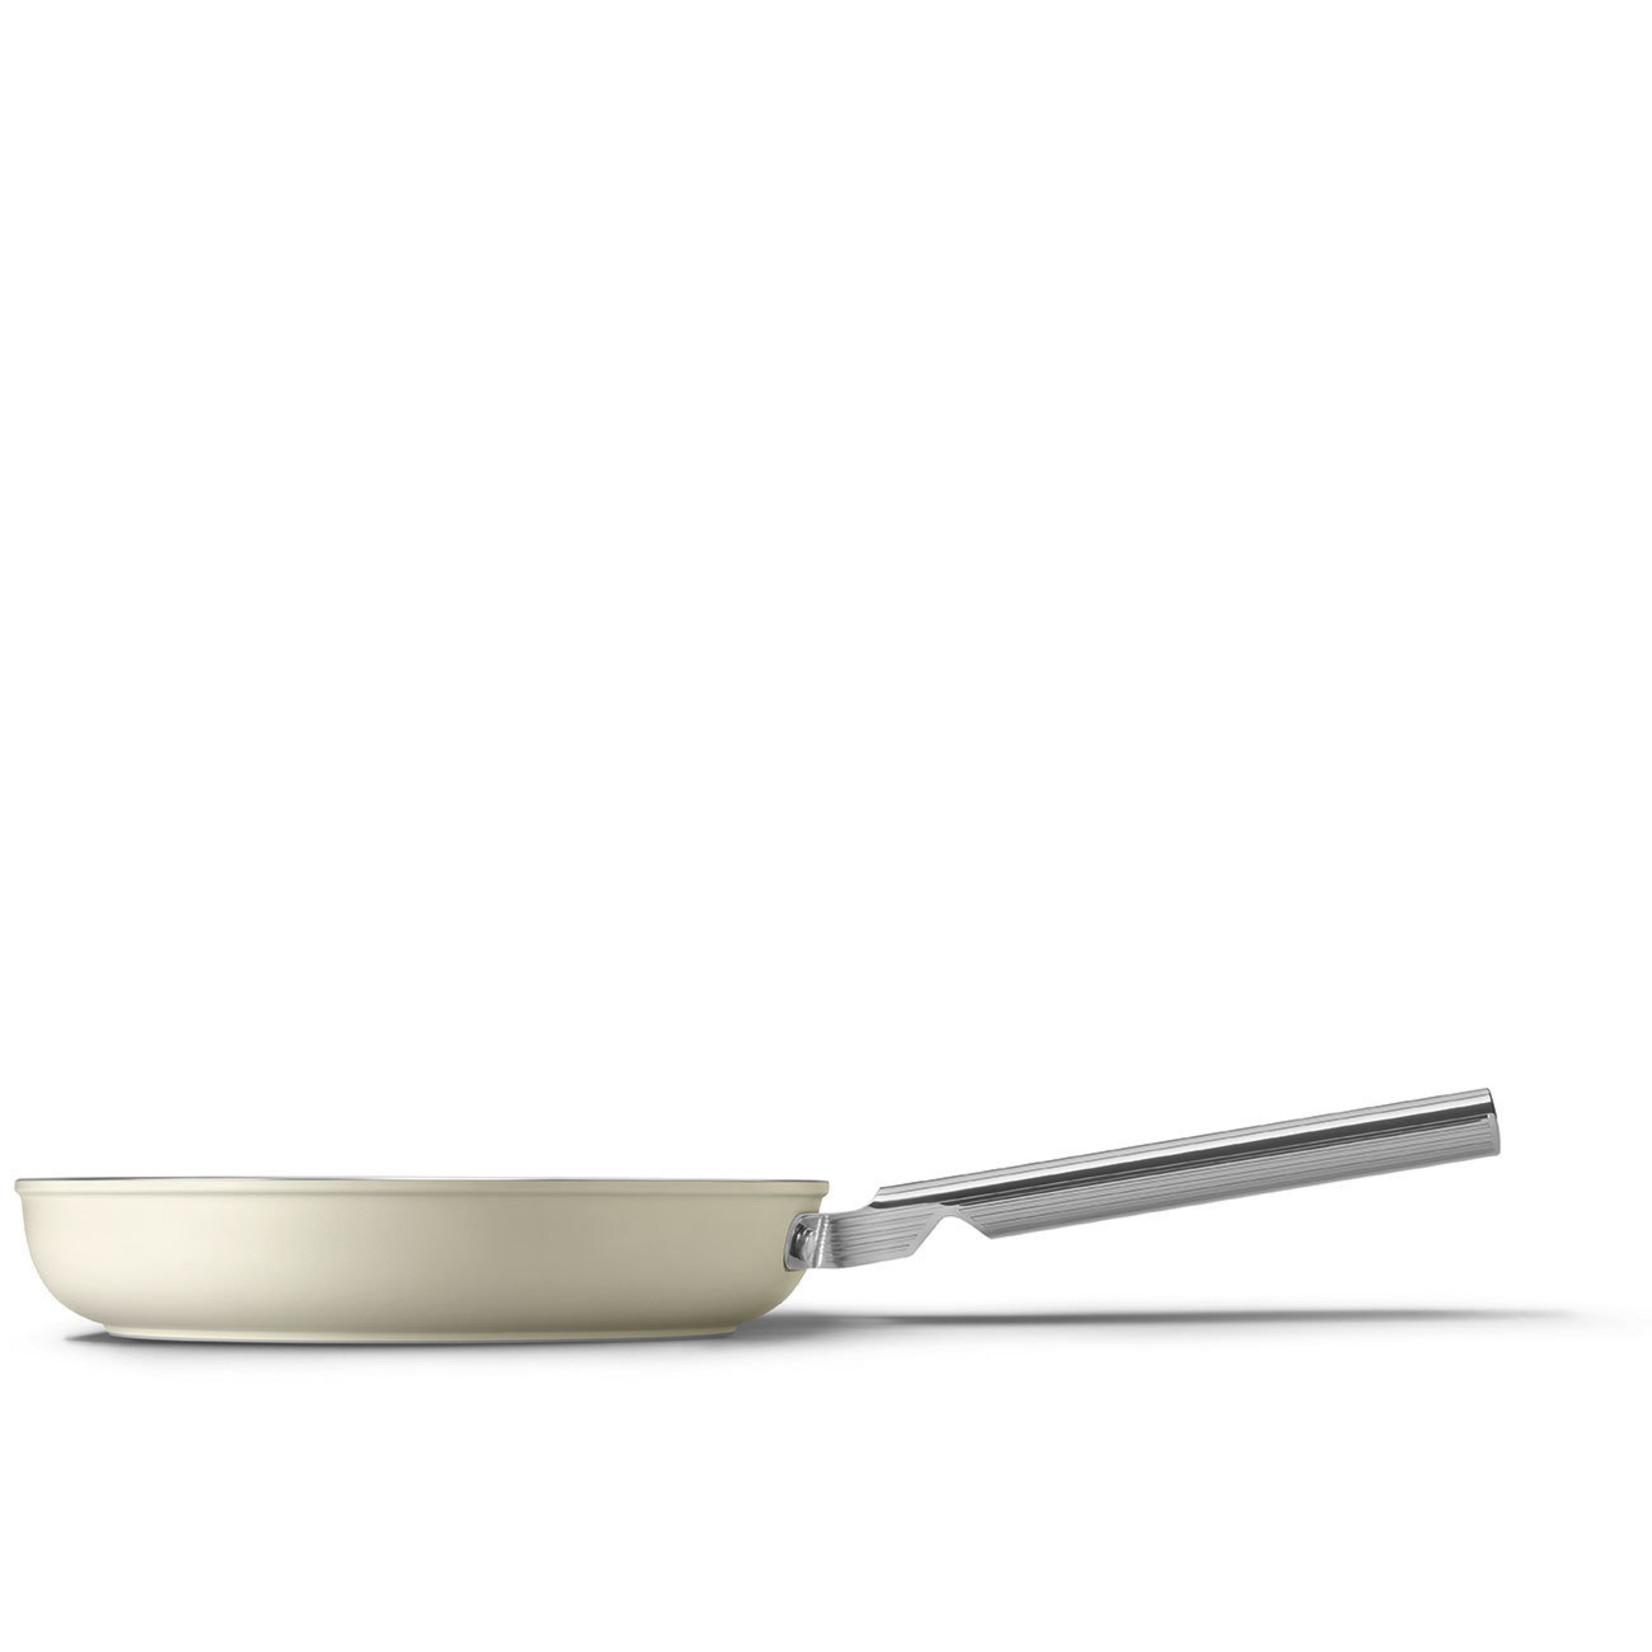 Smeg SMEG Koekenpan 28 cm, anti-aanbaklaag, crème mat